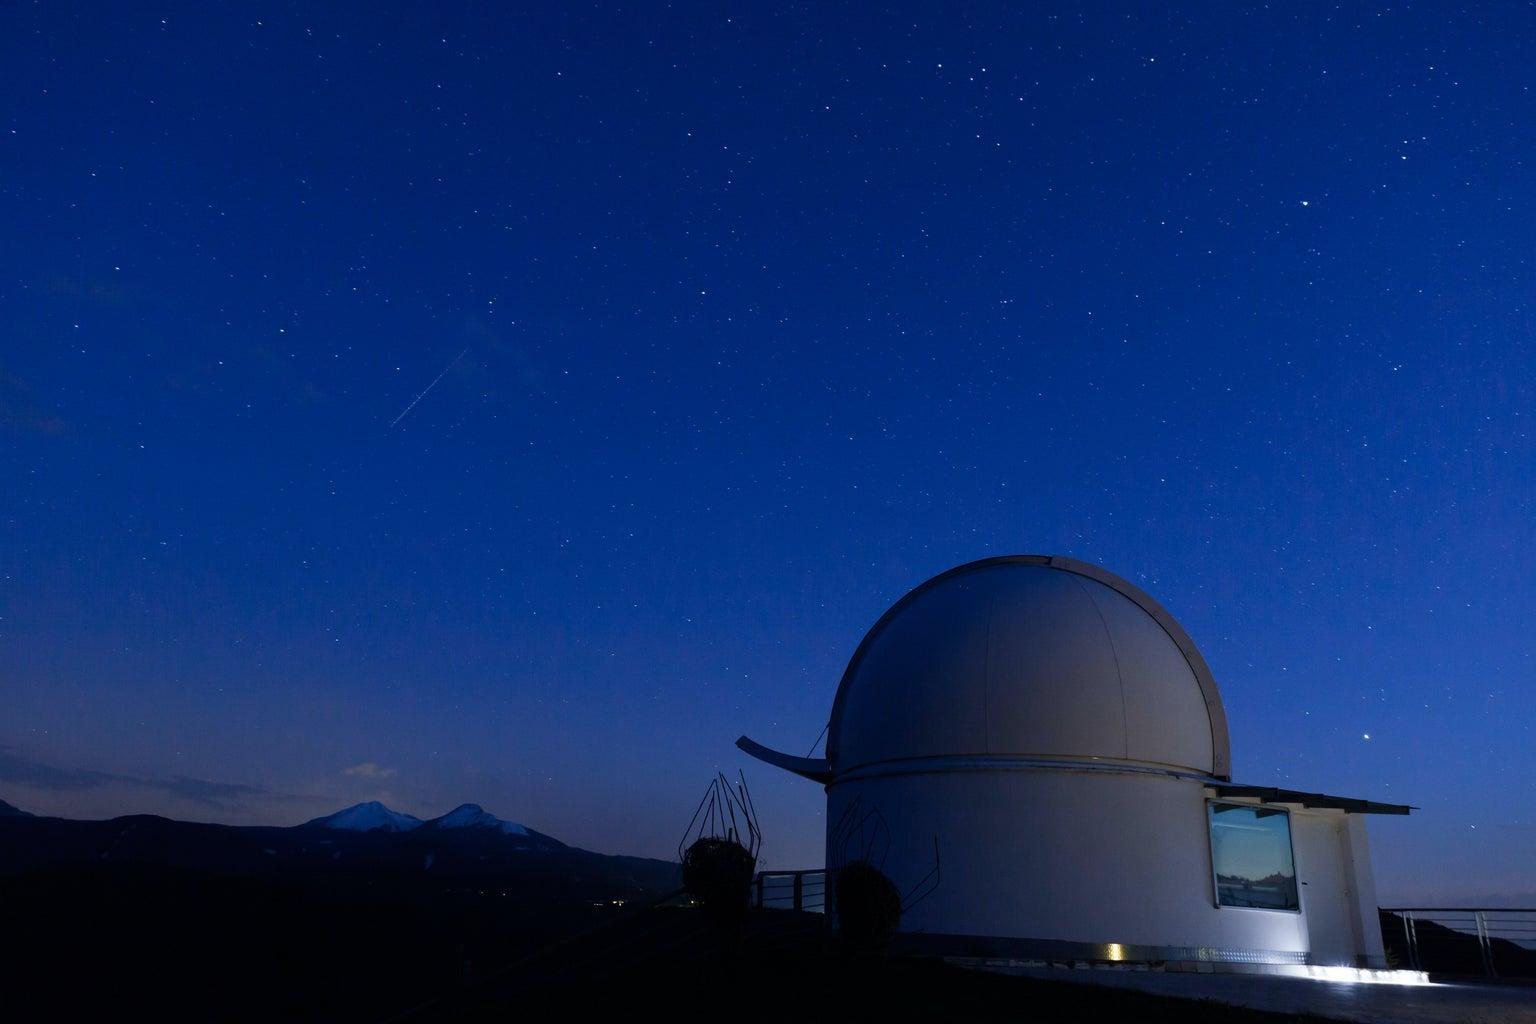 Observatory against blue sky